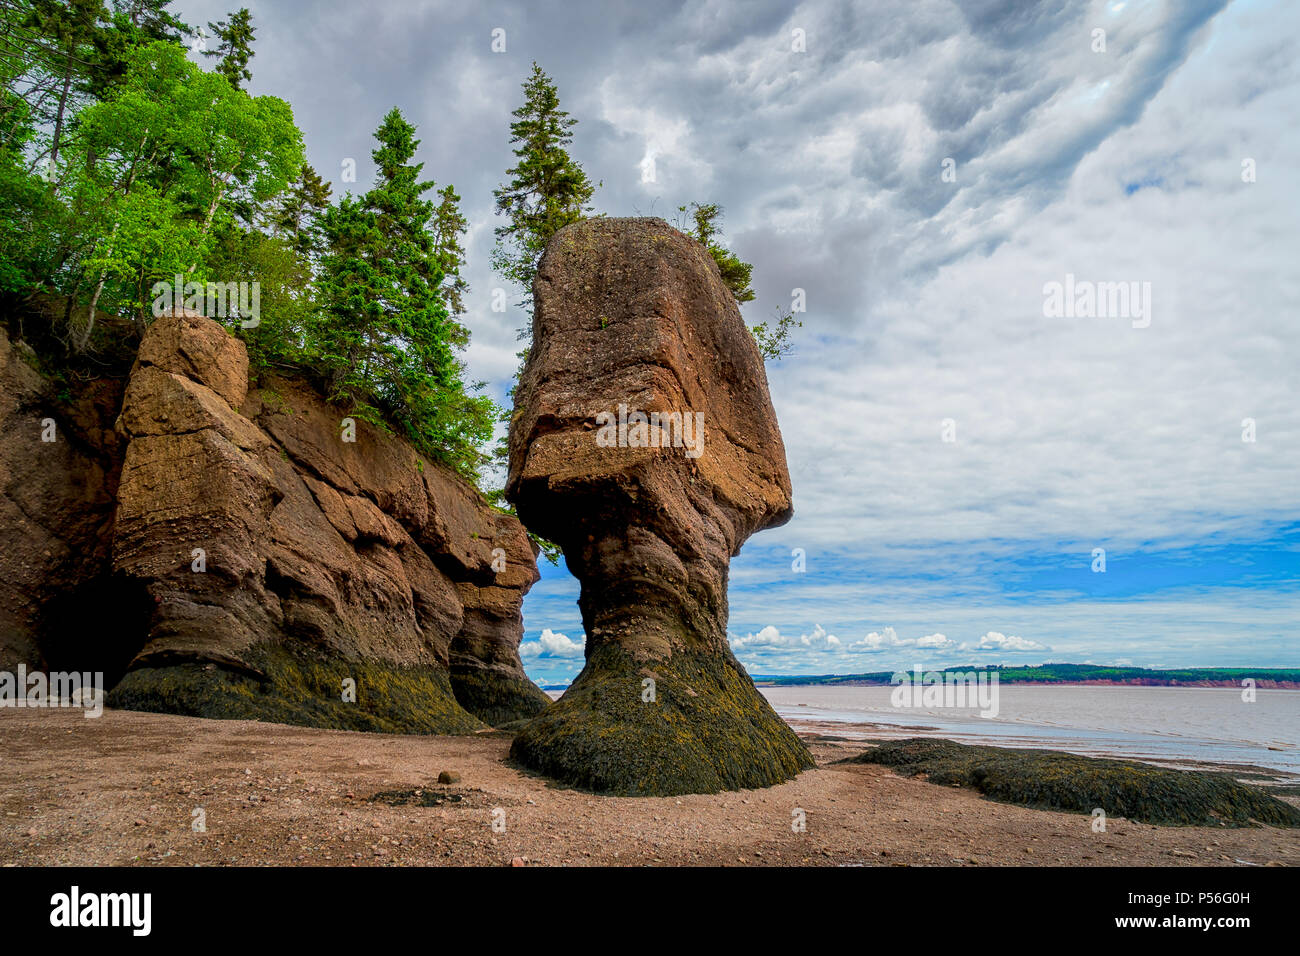 Genial The Hopewell Rocks Also Known As The Flowerpot Rocks, Along ...